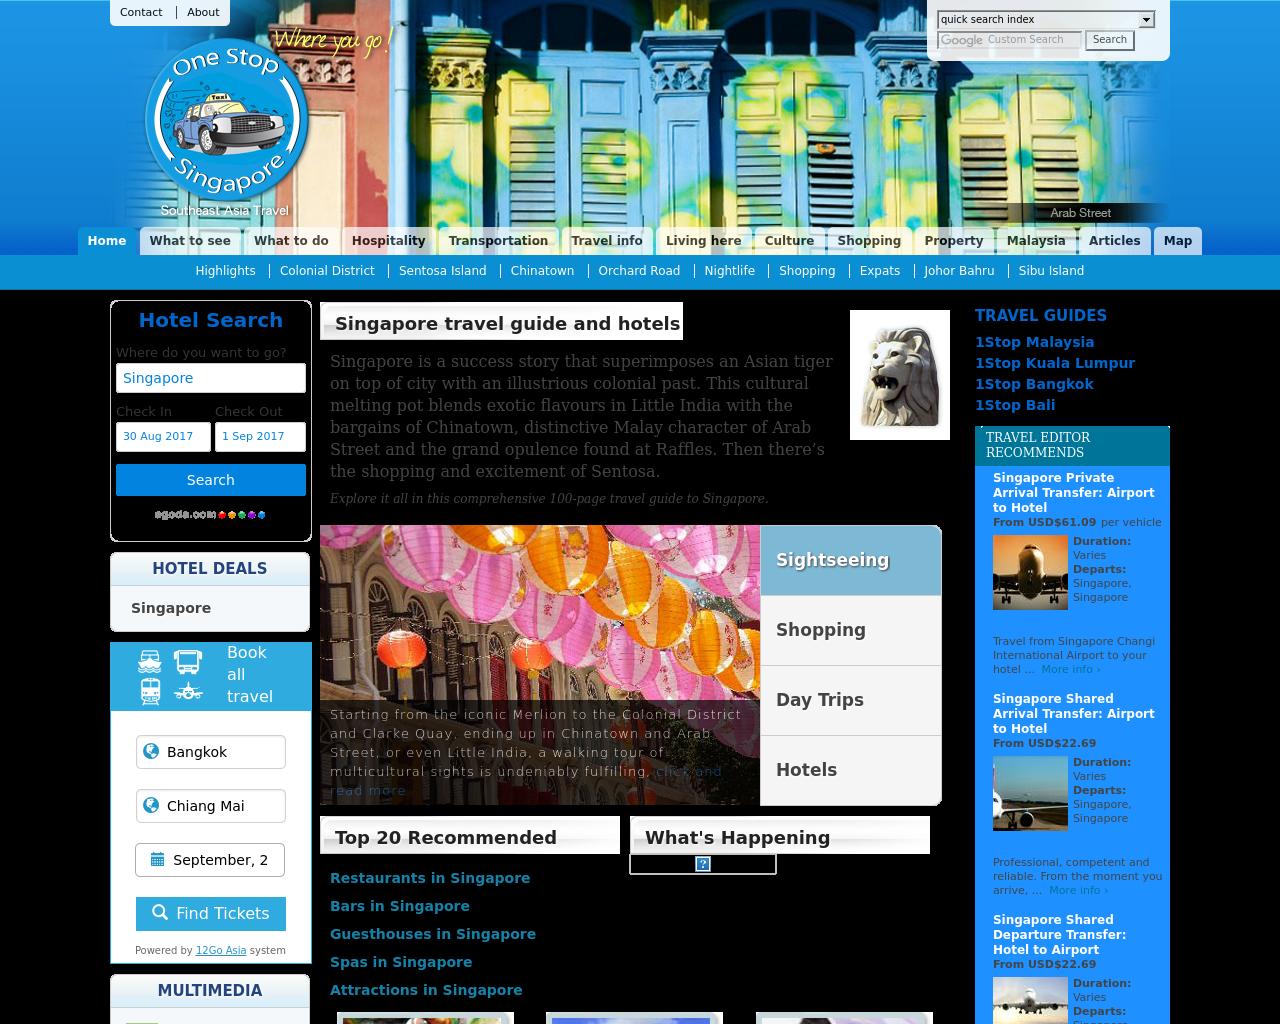 1stop-Singapore-Advertising-Reviews-Pricing